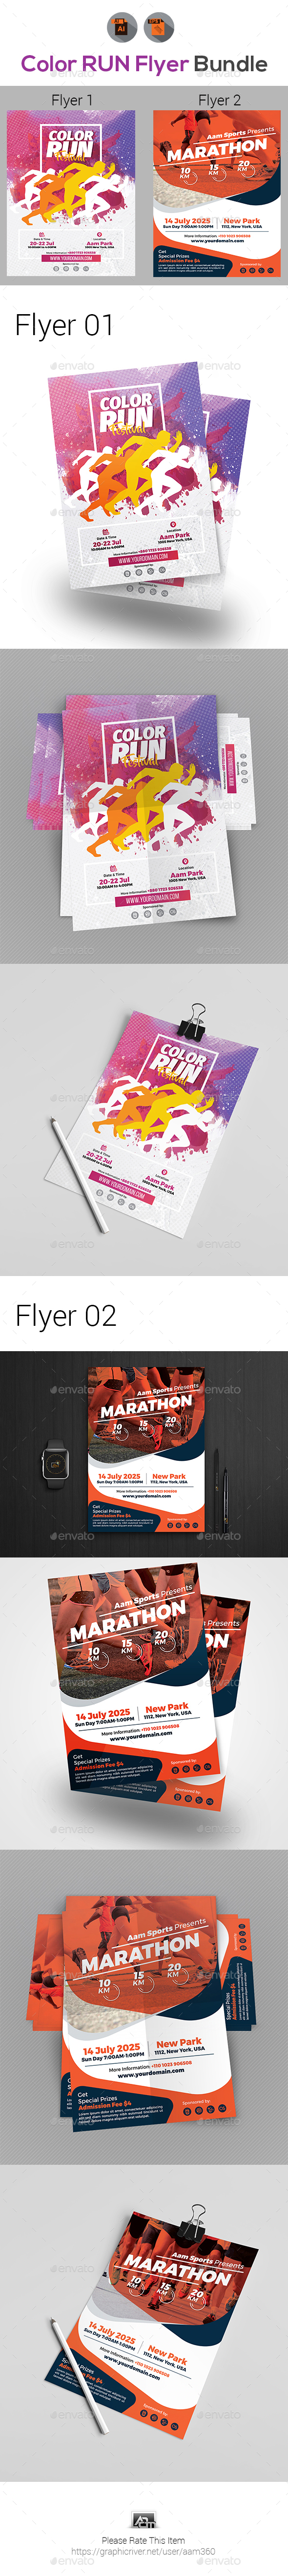 Color Run Event Flyers Bundle - Sports Events